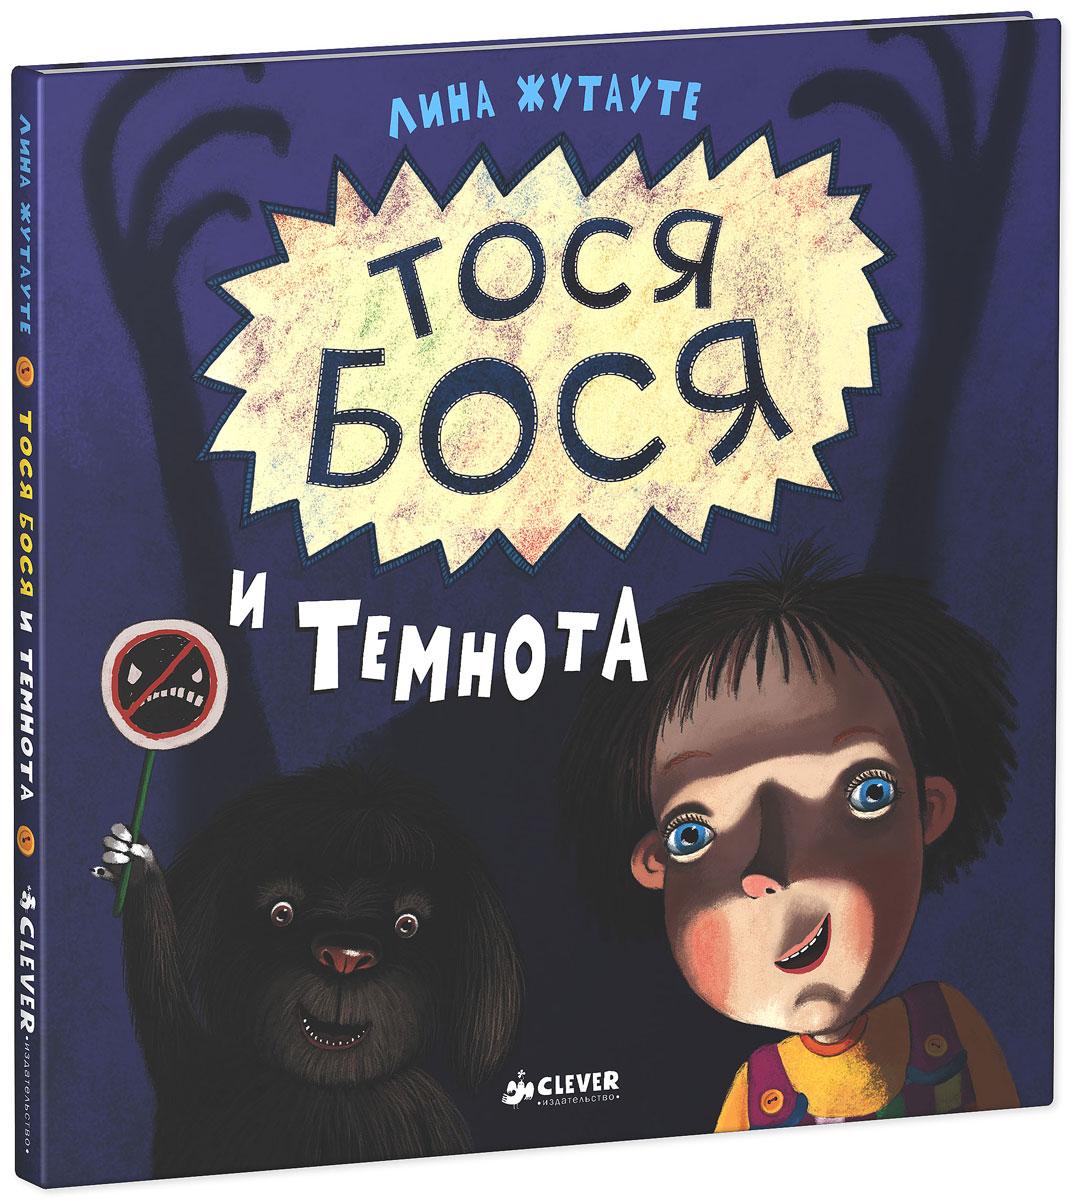 Лина Жутауте Тося-Бося и темнота clever книга тося бося идёт в зоопарк 3